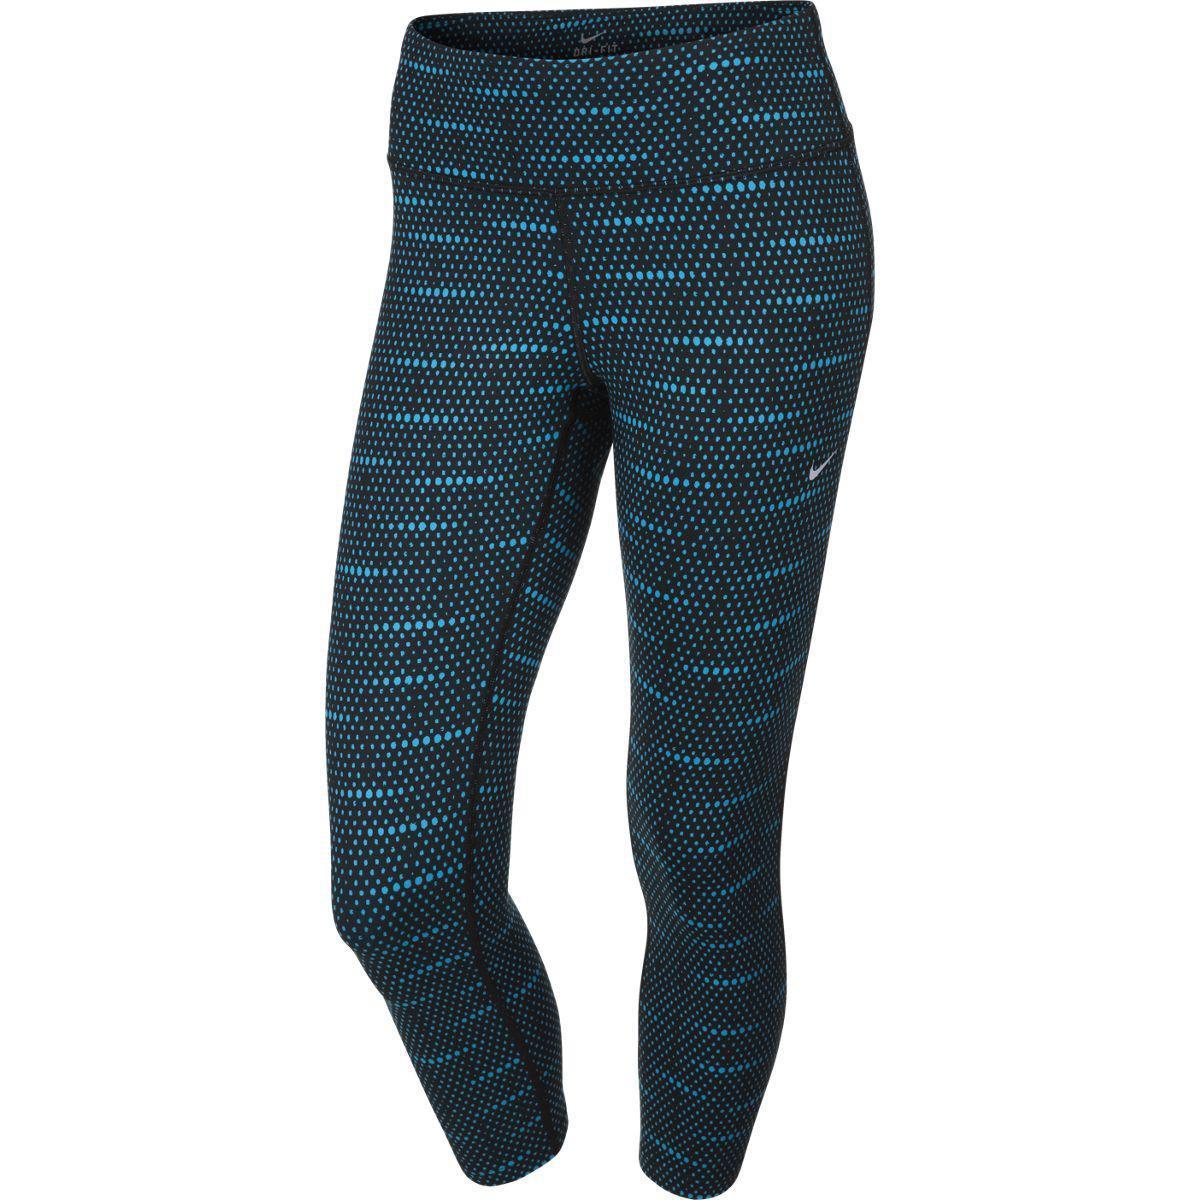 Nike Womens Dri-FIT Epic Run Tights - Black Blue Lagoon Reflective Silver -  Tennisnuts.com 63609b77a2